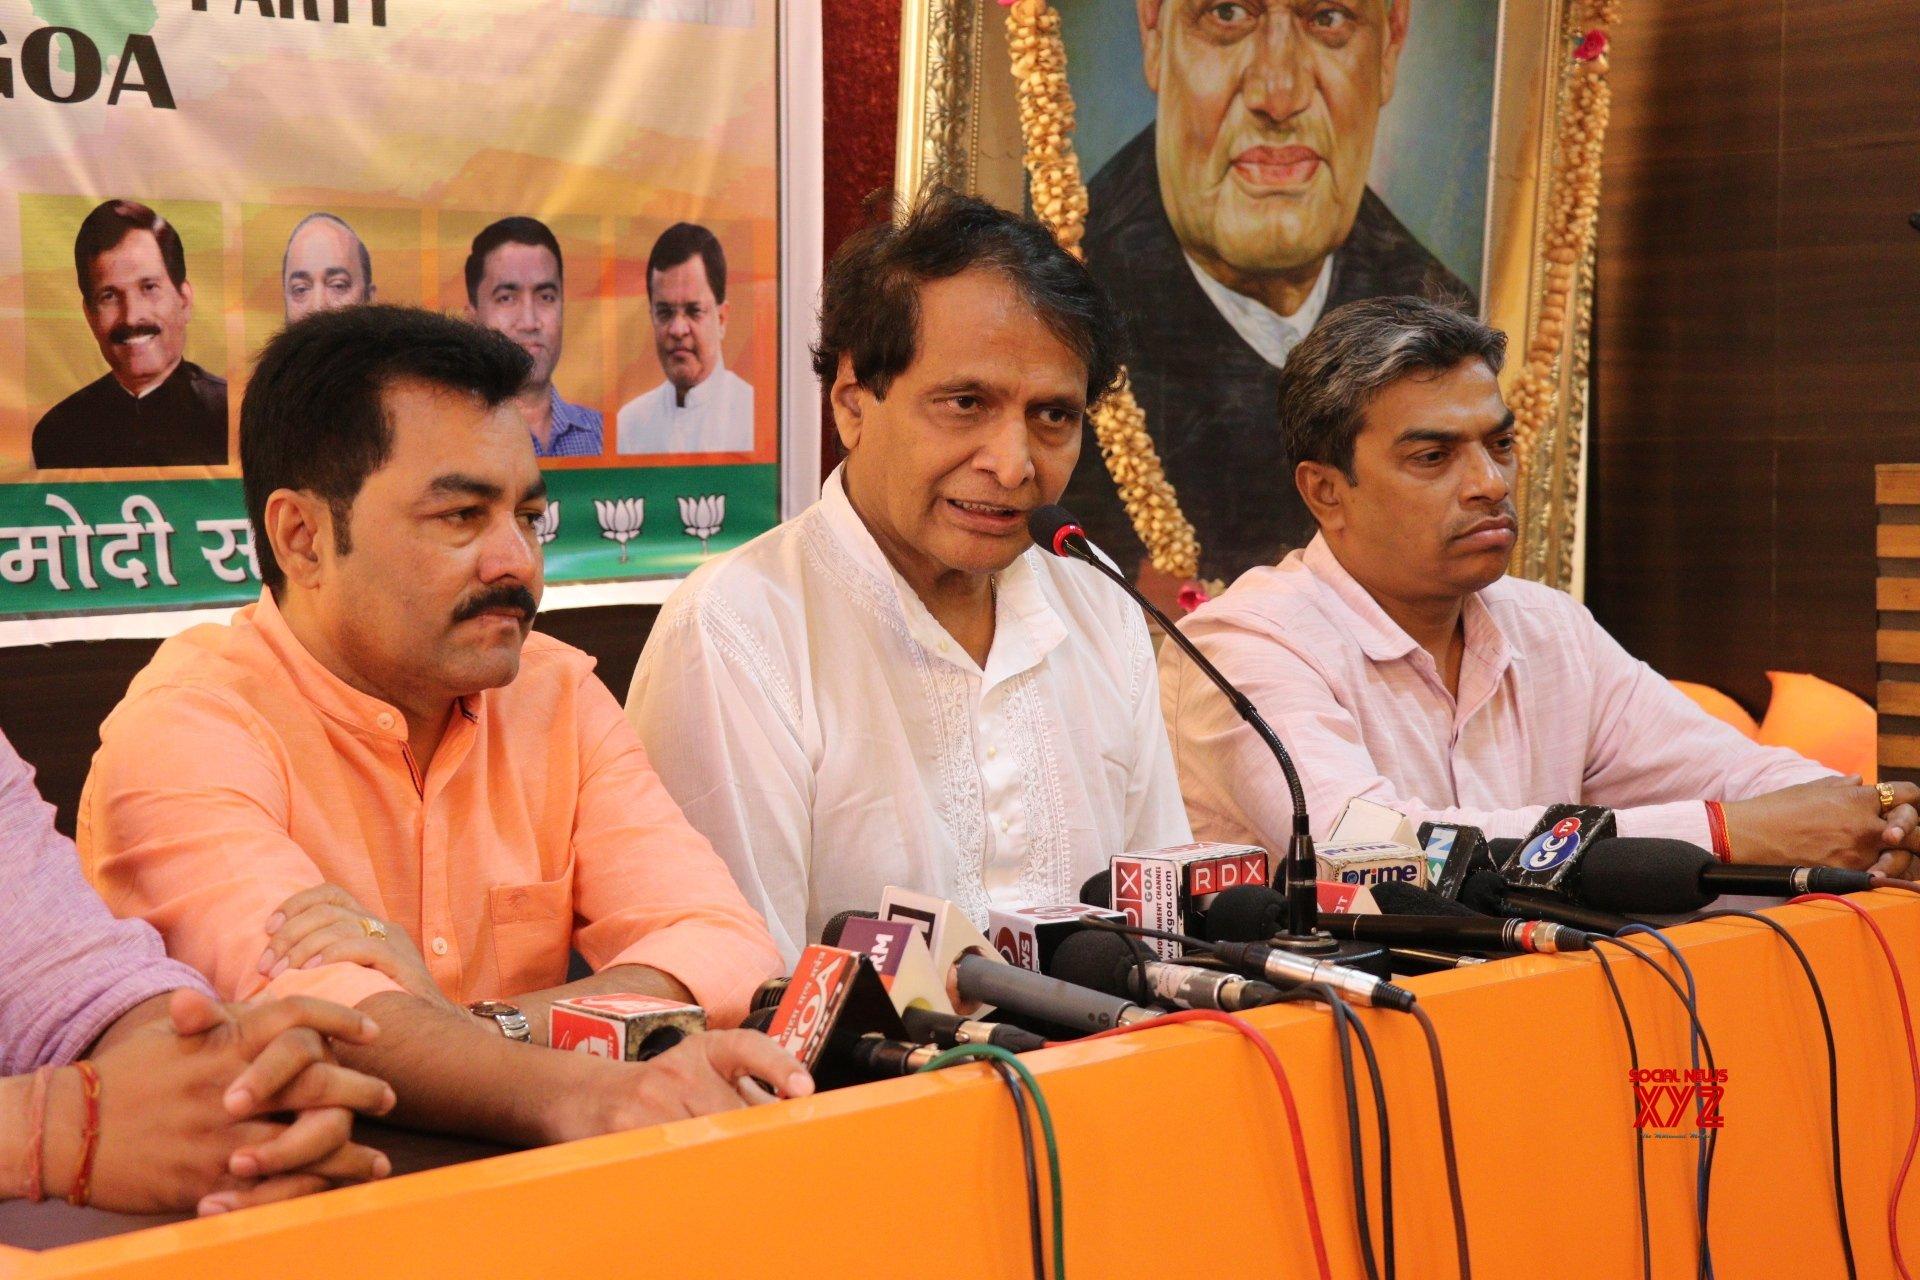 Panaji: Suresh Prabhu's press conference #Gallery